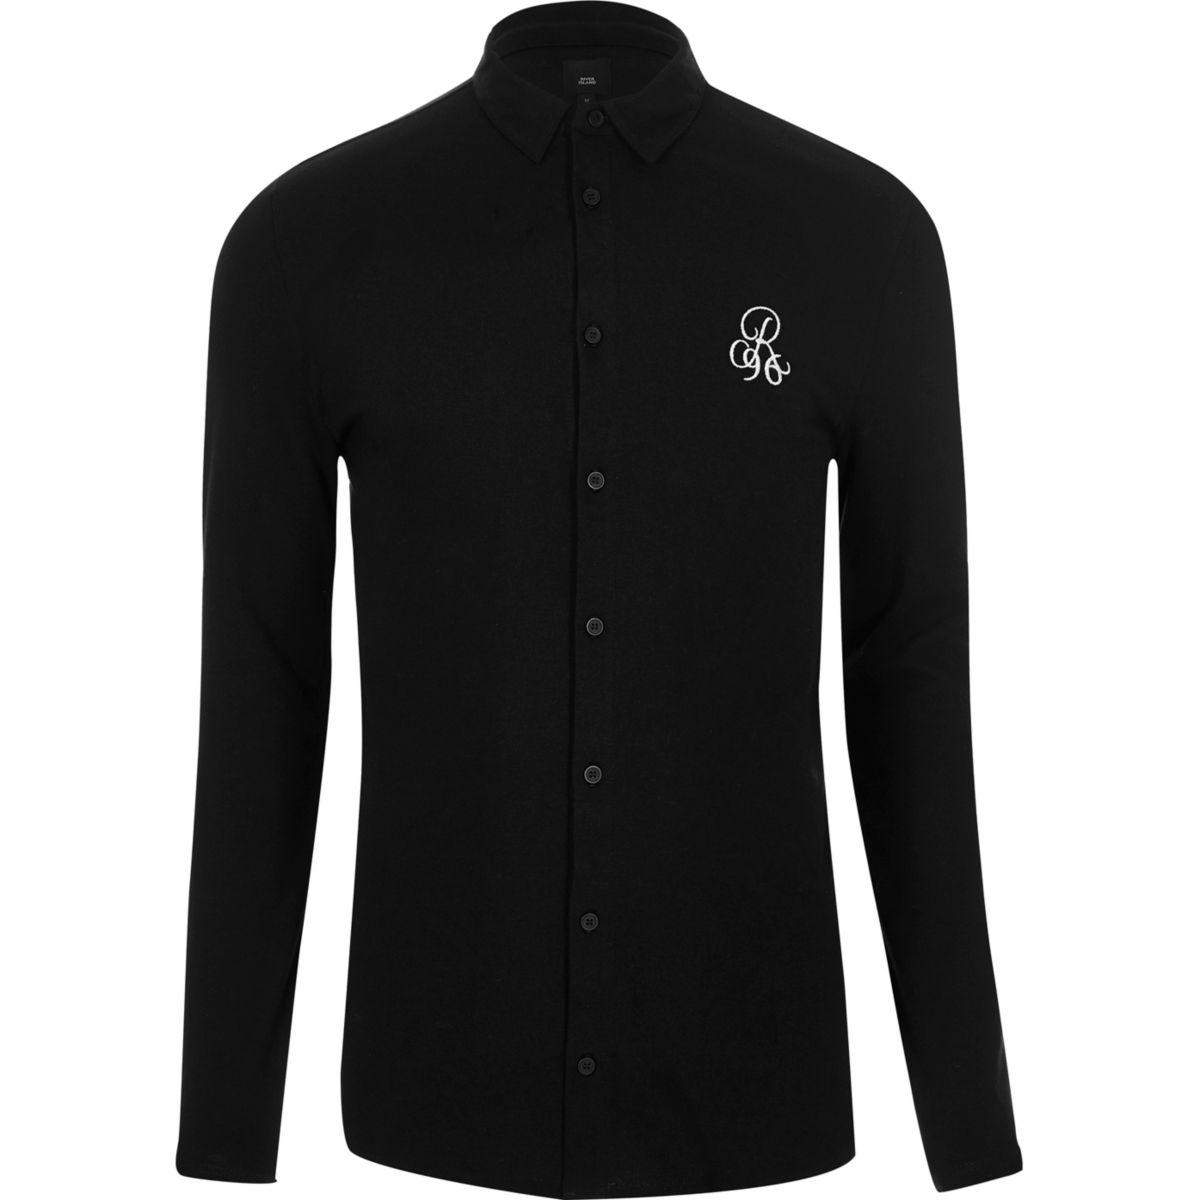 Black pique muscle fit long sleeve shirt